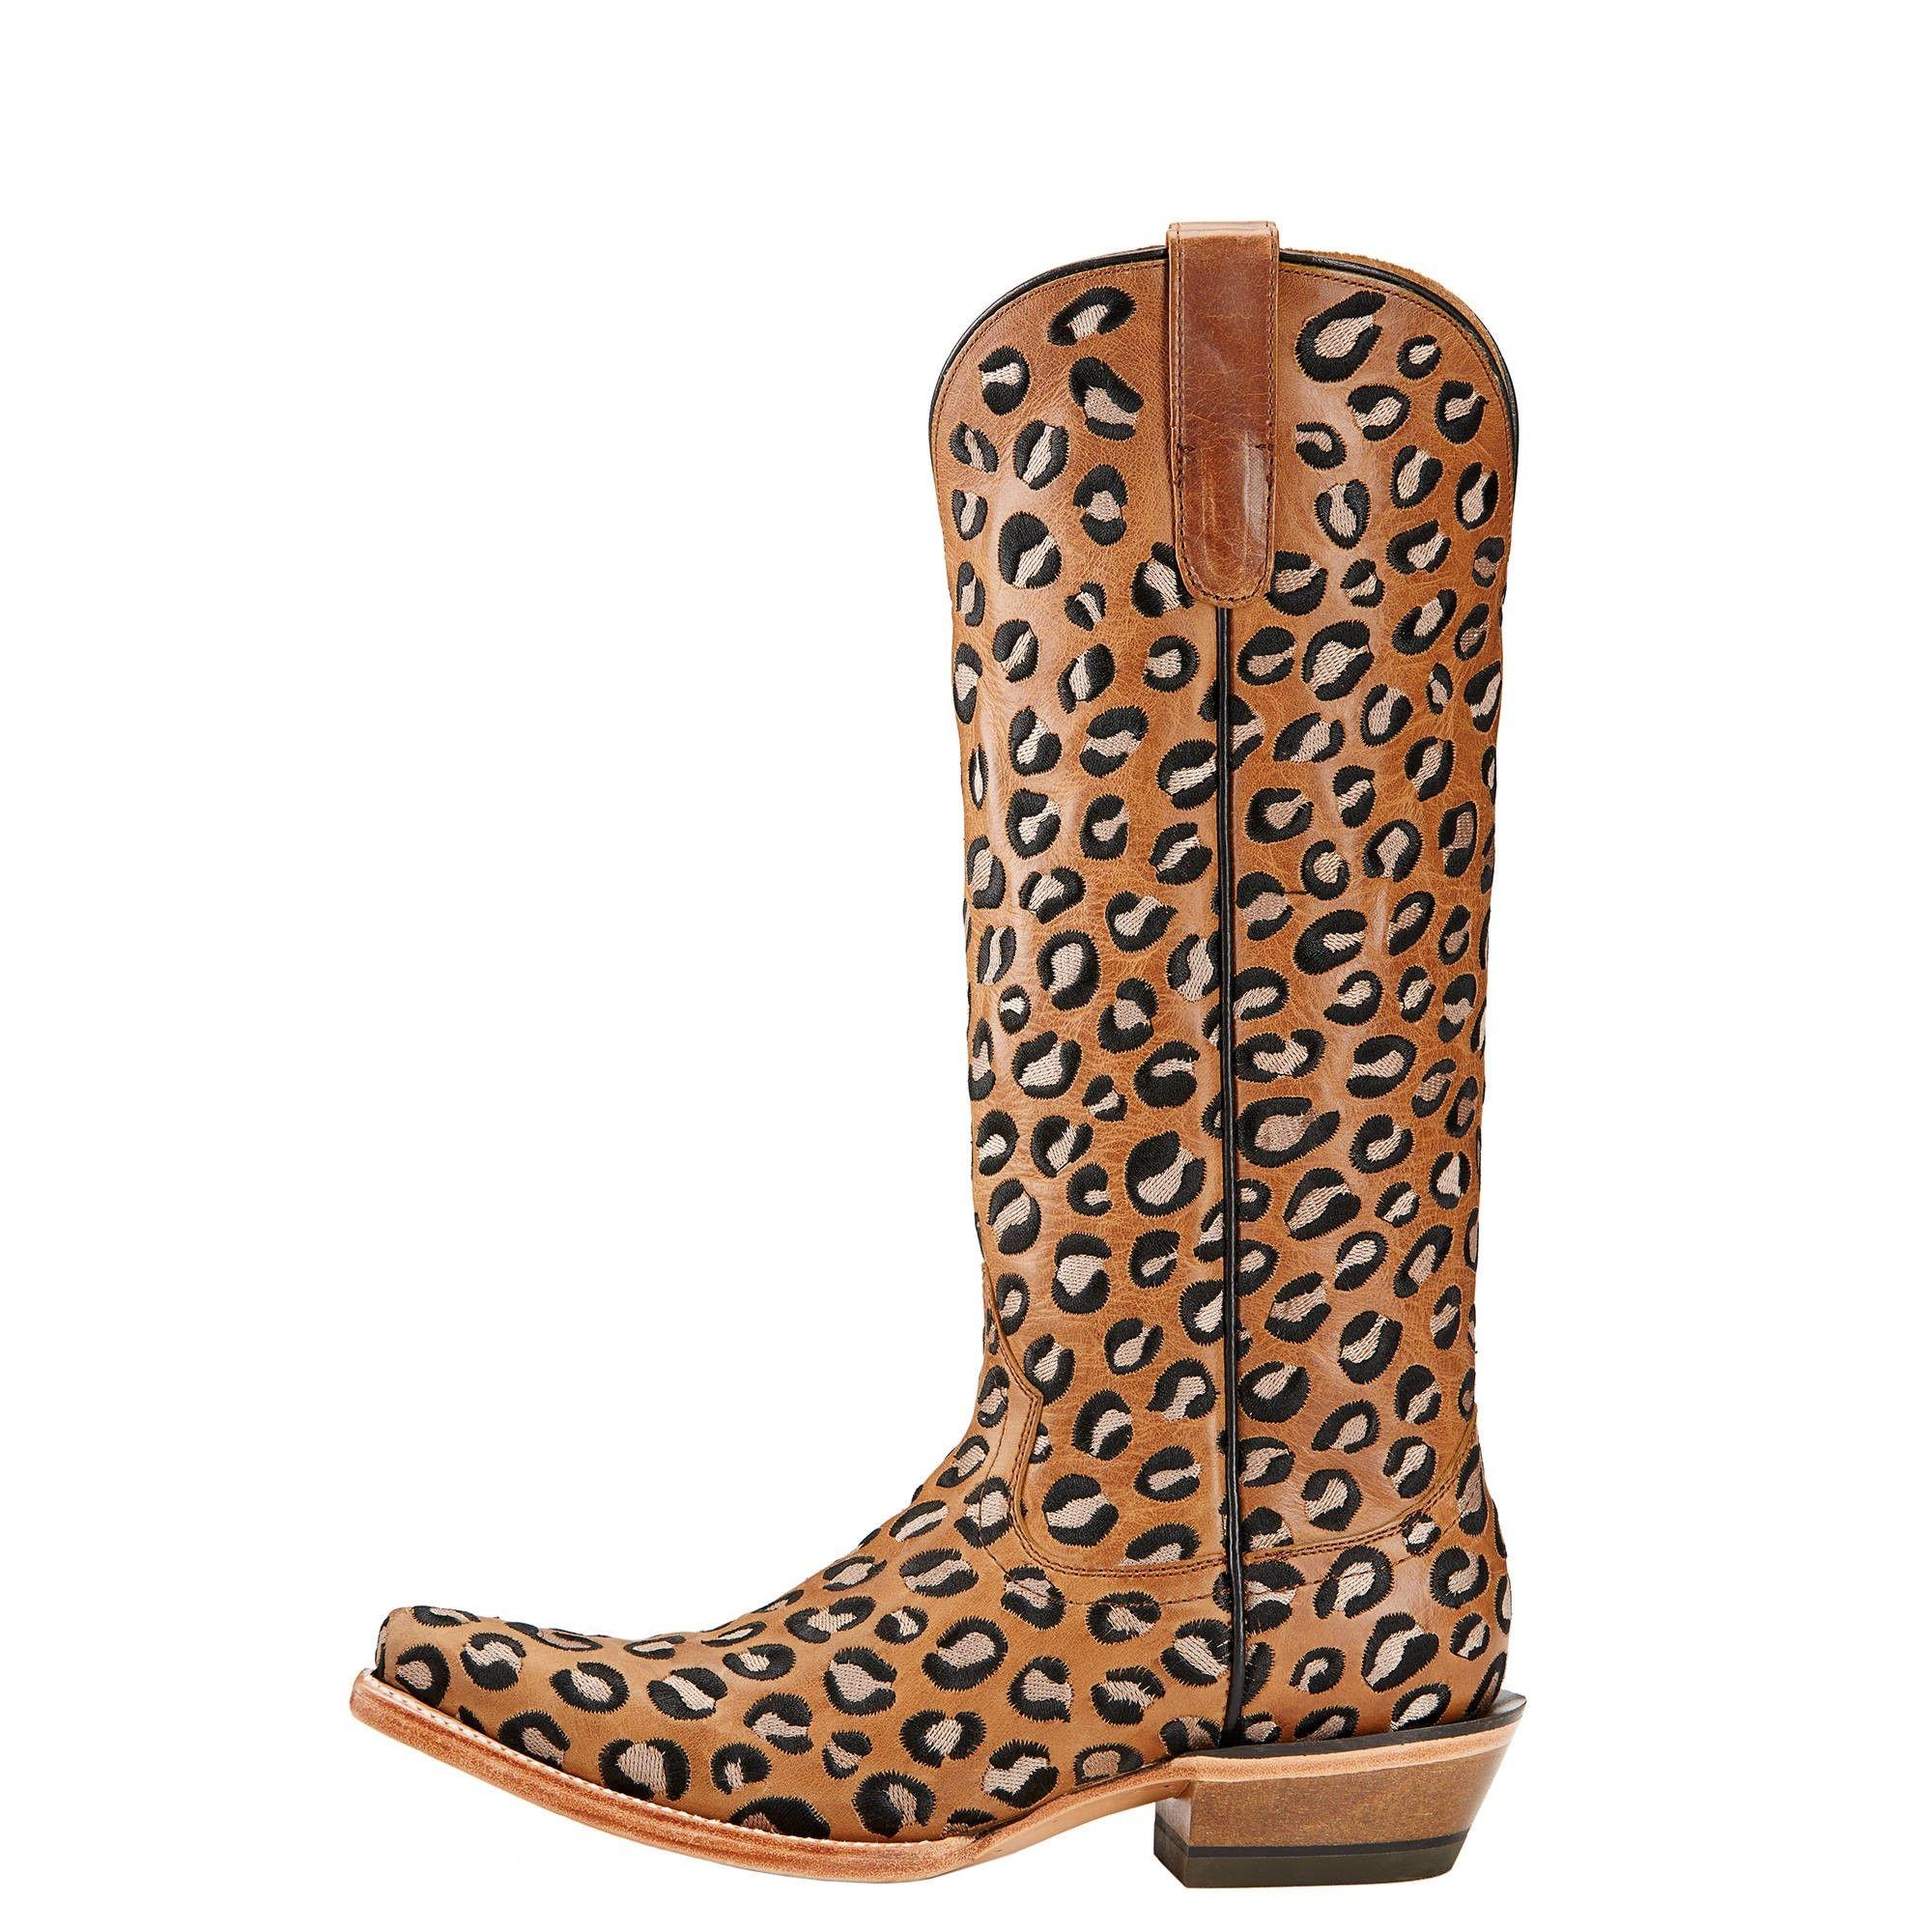 Leopard print cowboy boots!!! We LOVE this wild style. Women's Ariat Wildcat